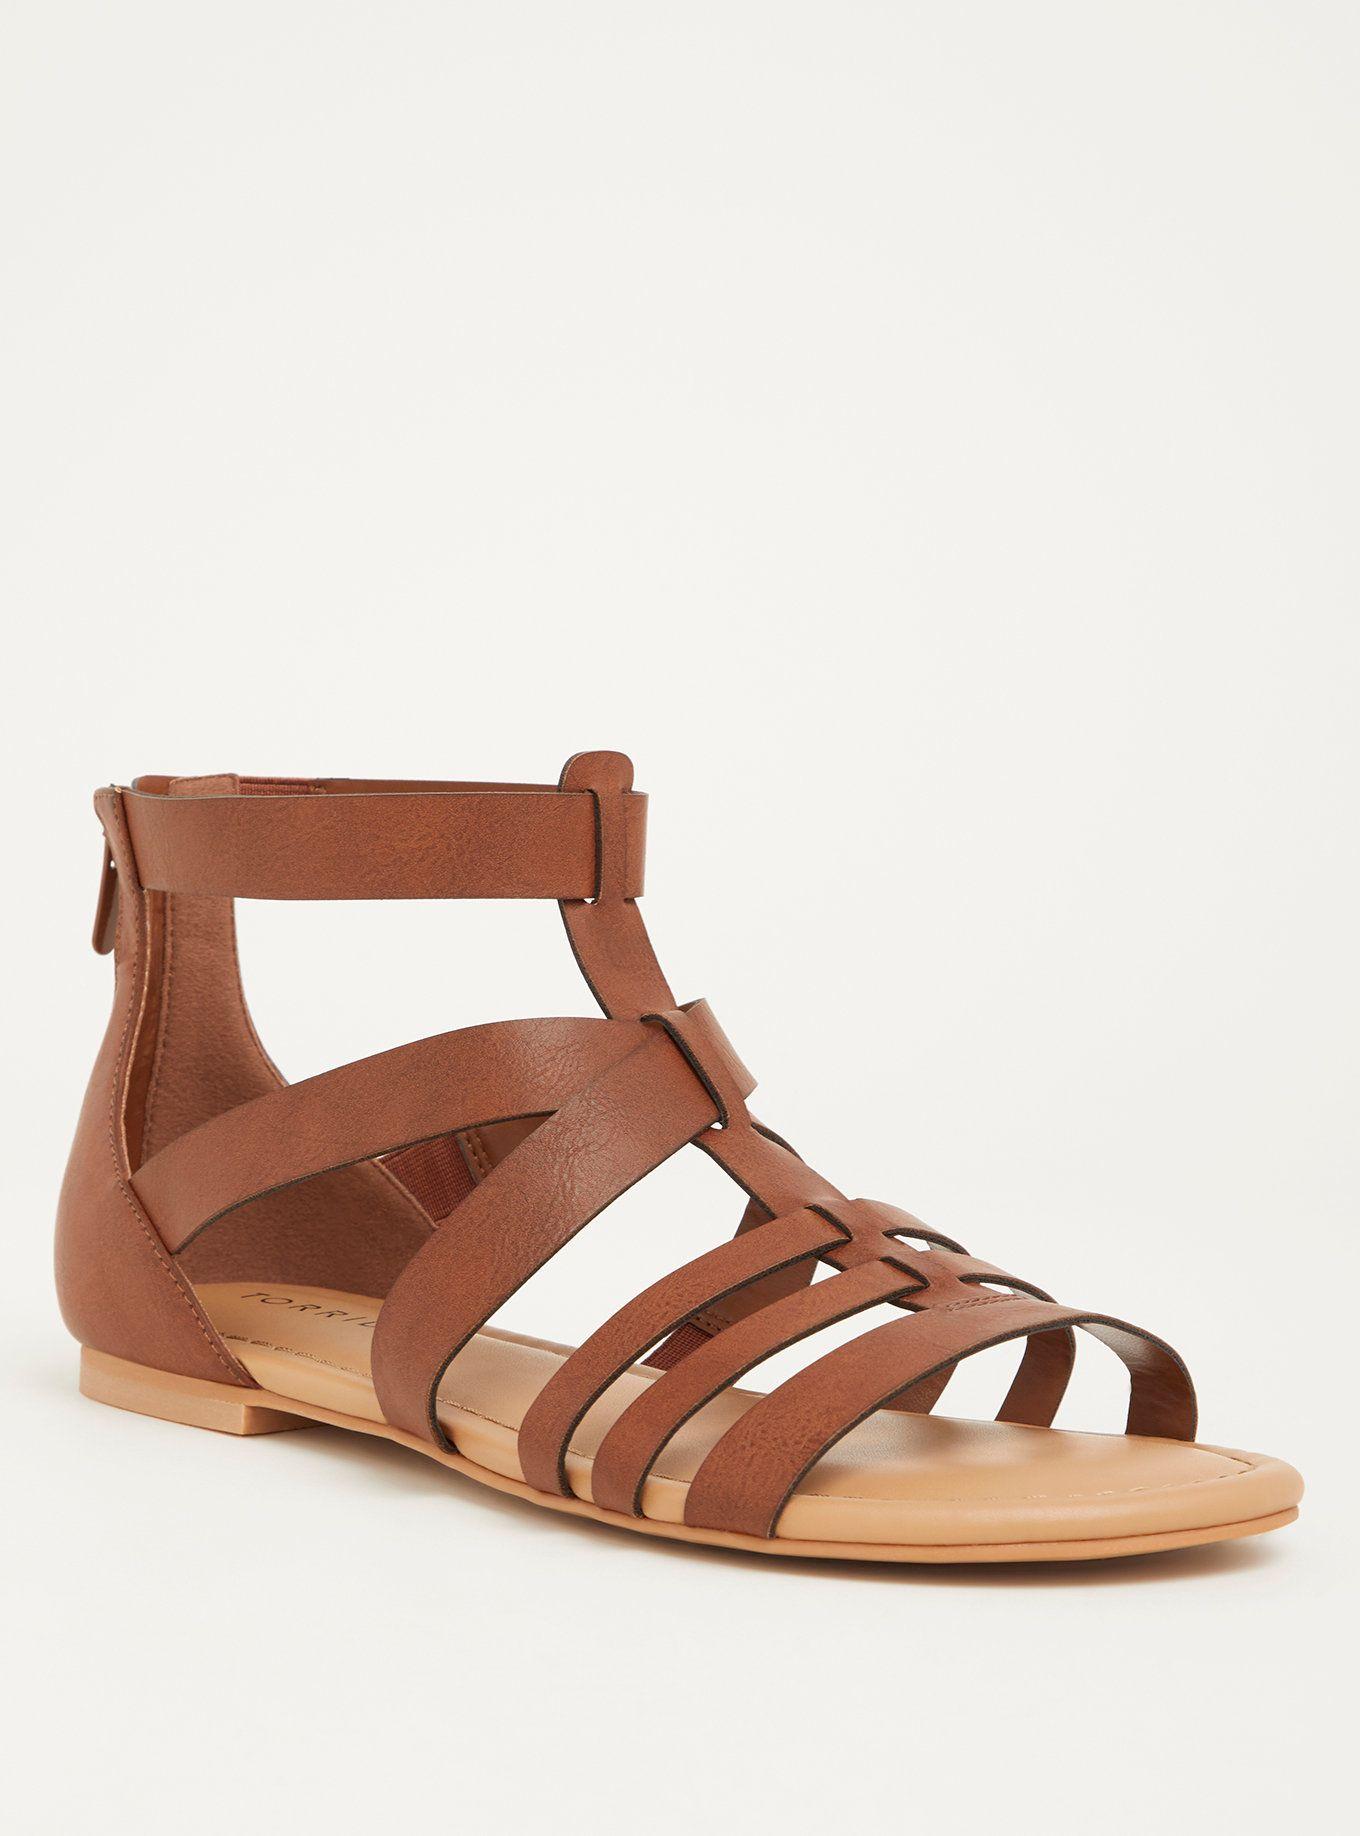 5941266725a Brown Gladiator Sandal (Wide Width) in 2019